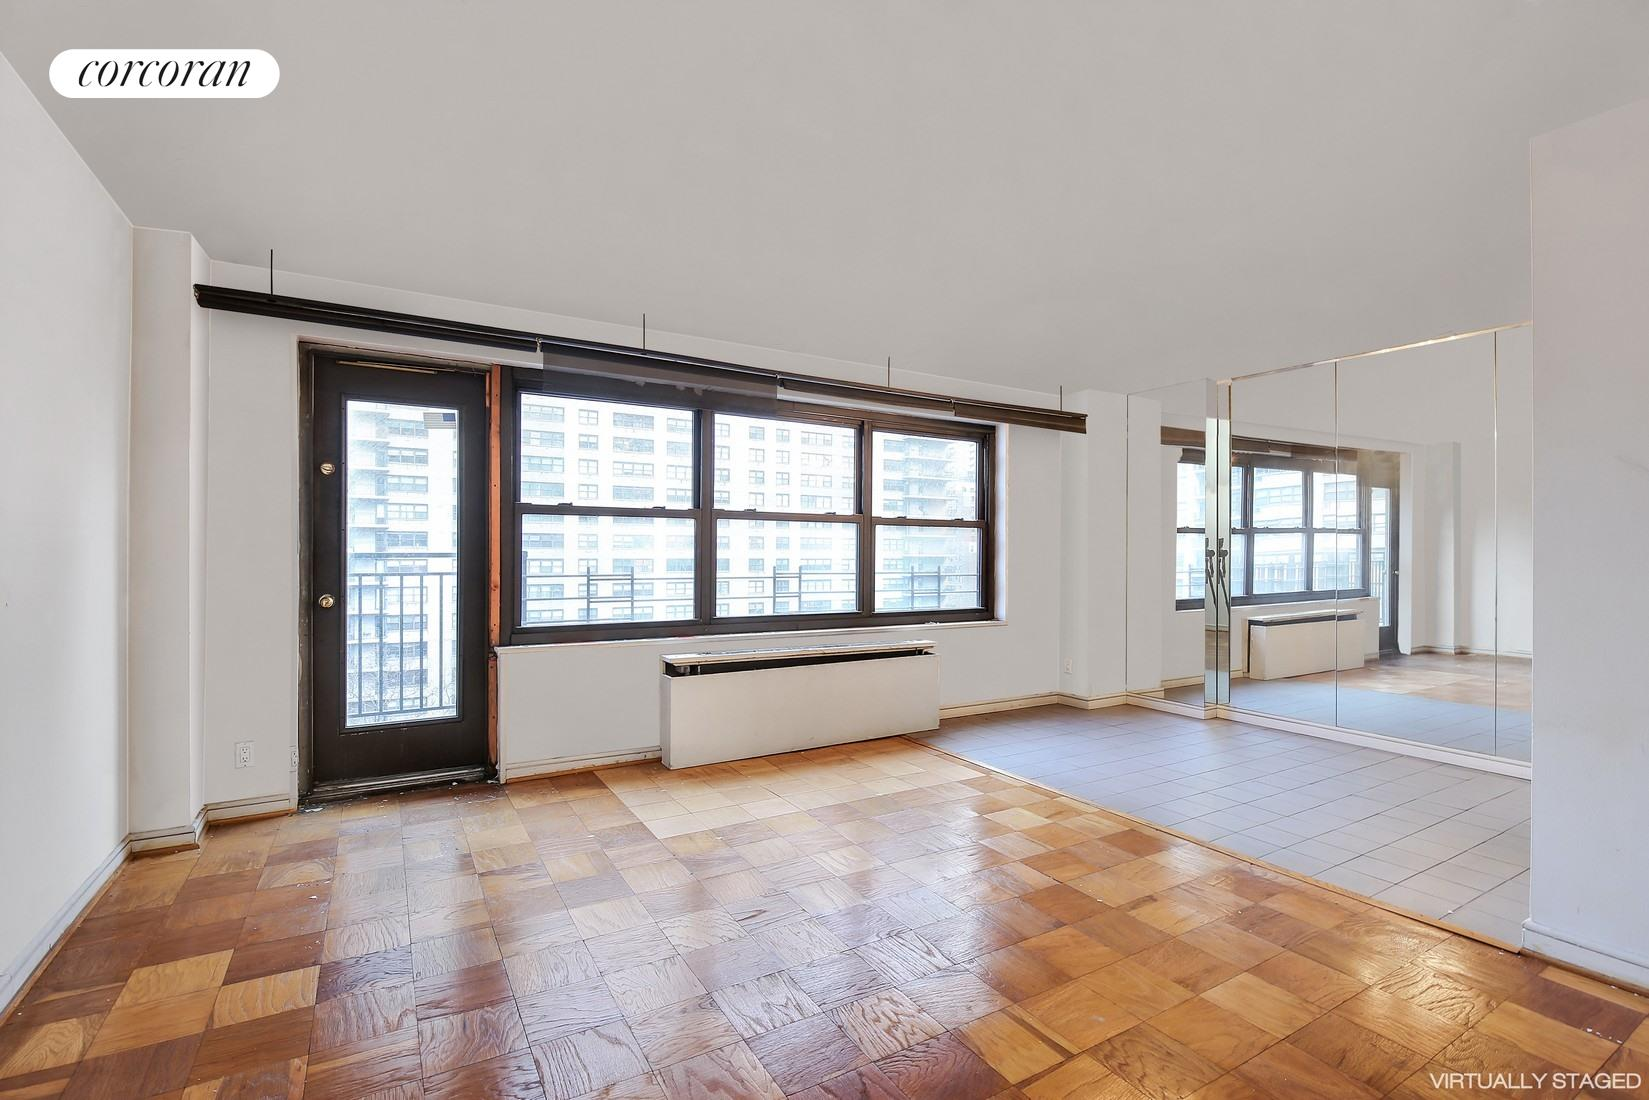 Corcoran, 150 West End Avenue, Apt. 11D, Upper West Side Real Estate ...